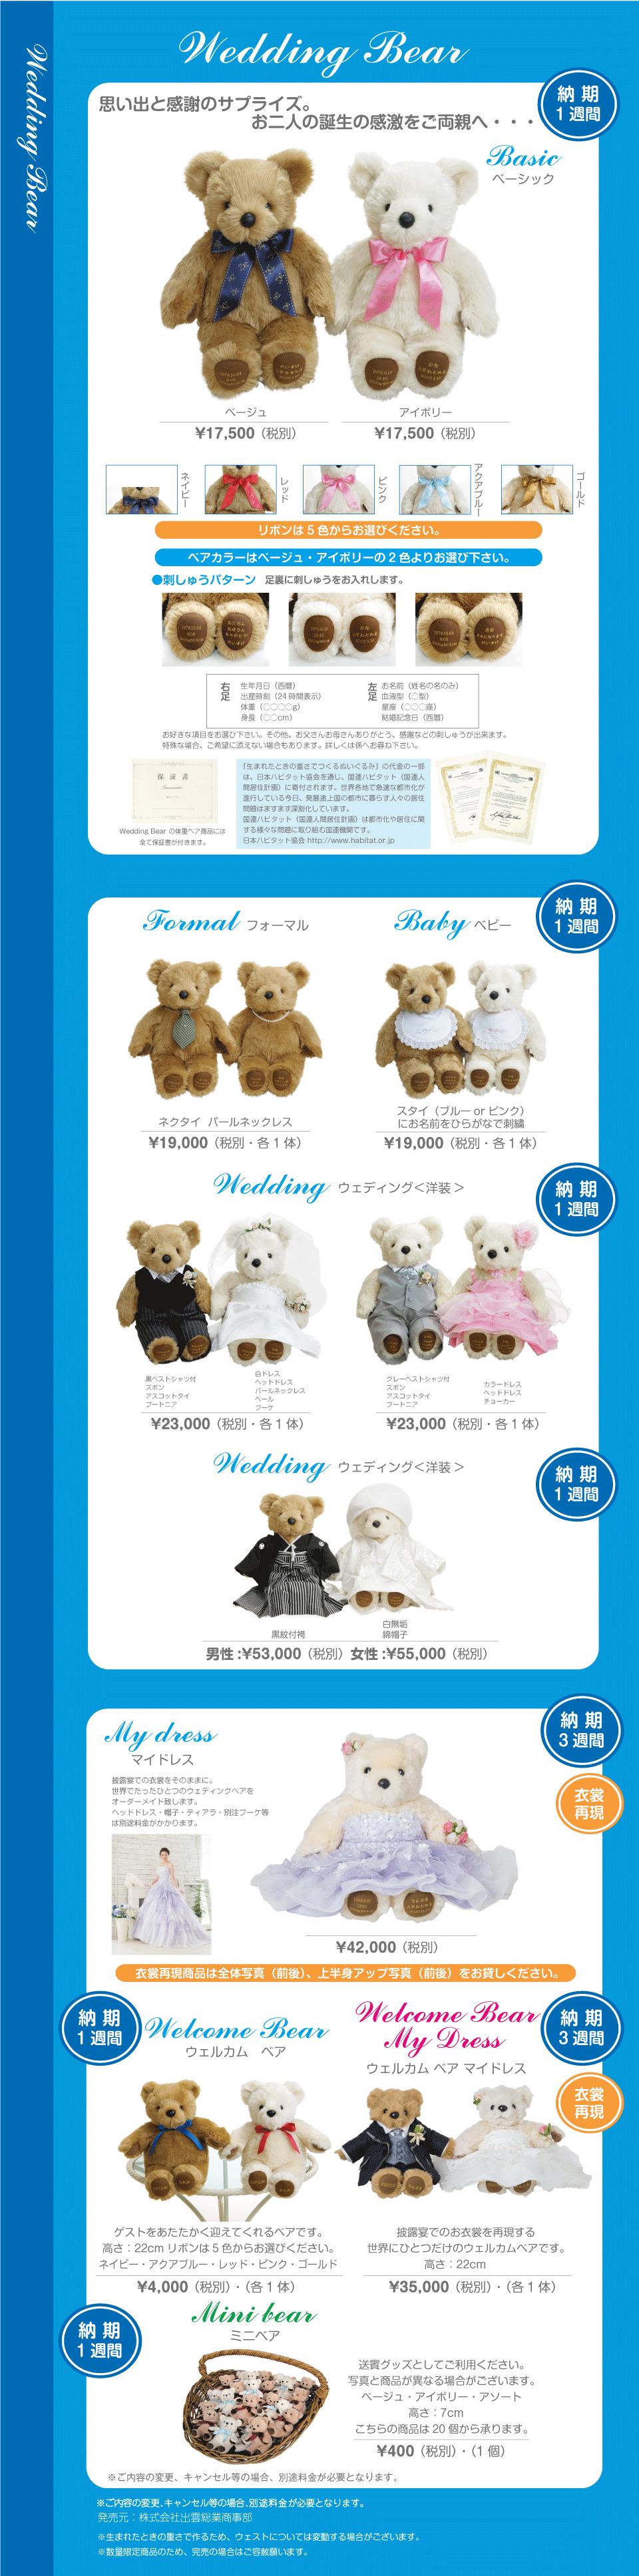 Wedding bear(ウェディングベア)